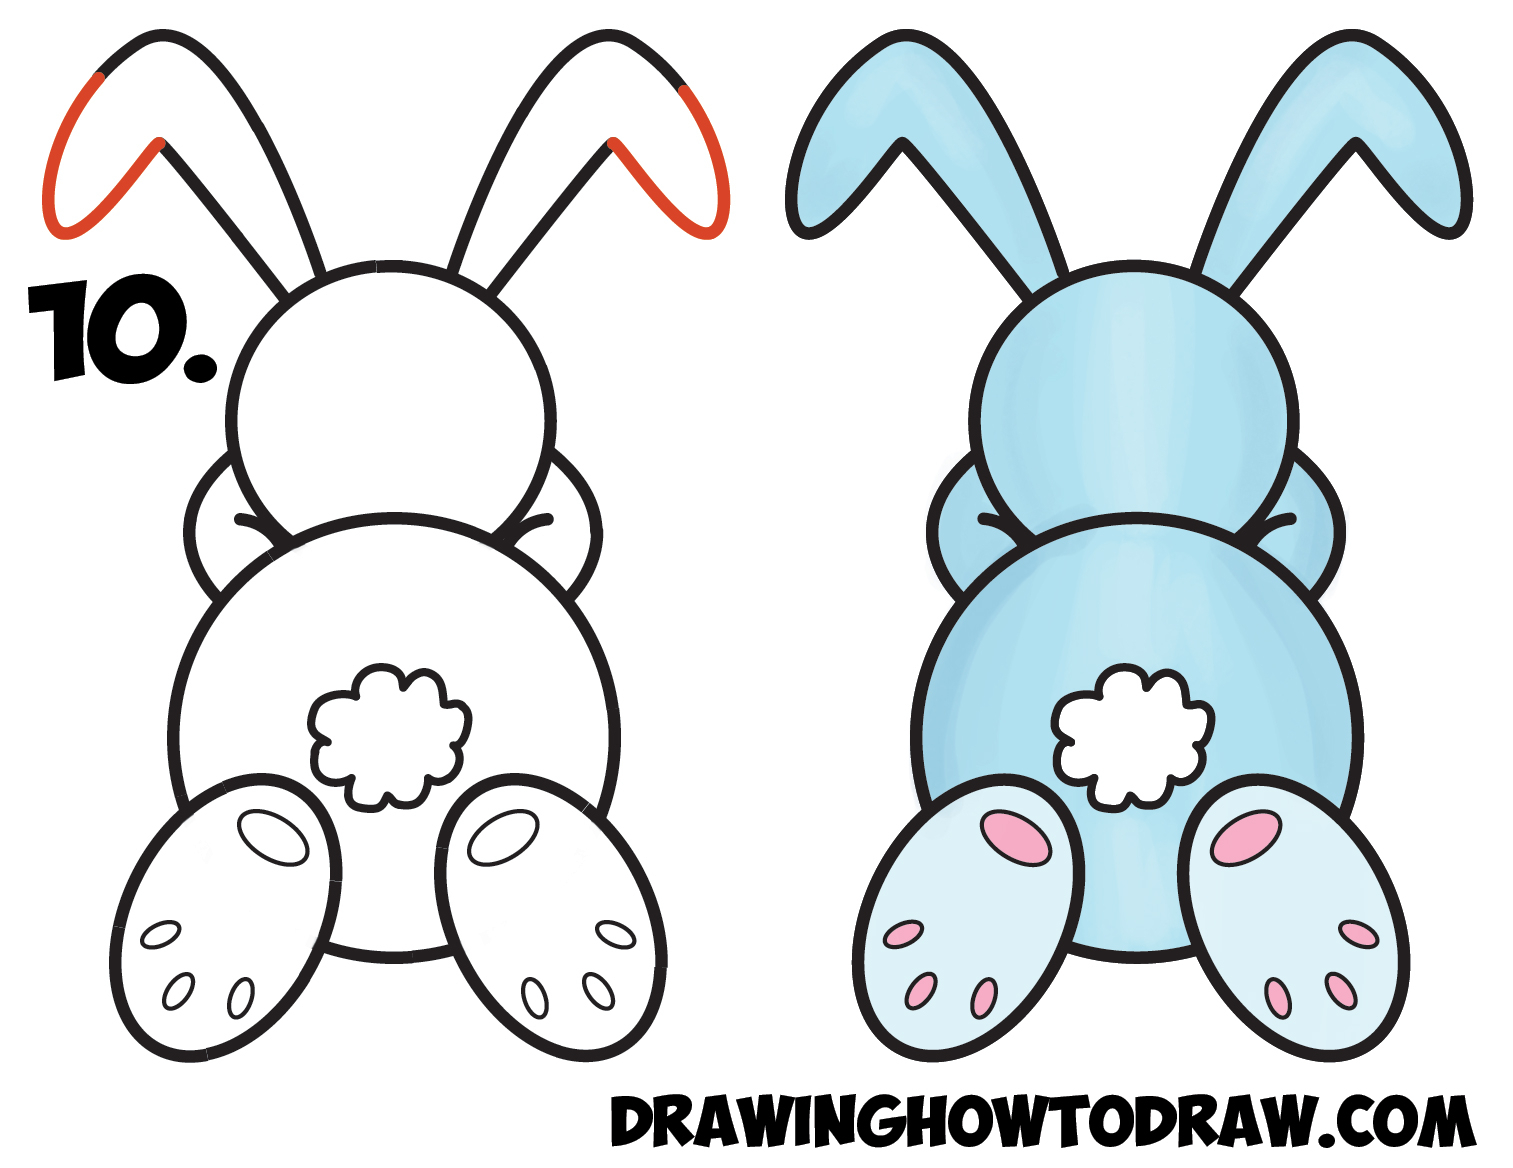 1513x1168 Bunny Rabbit Drawing How To Draw A Cute Cartoon Sleeping Bunny